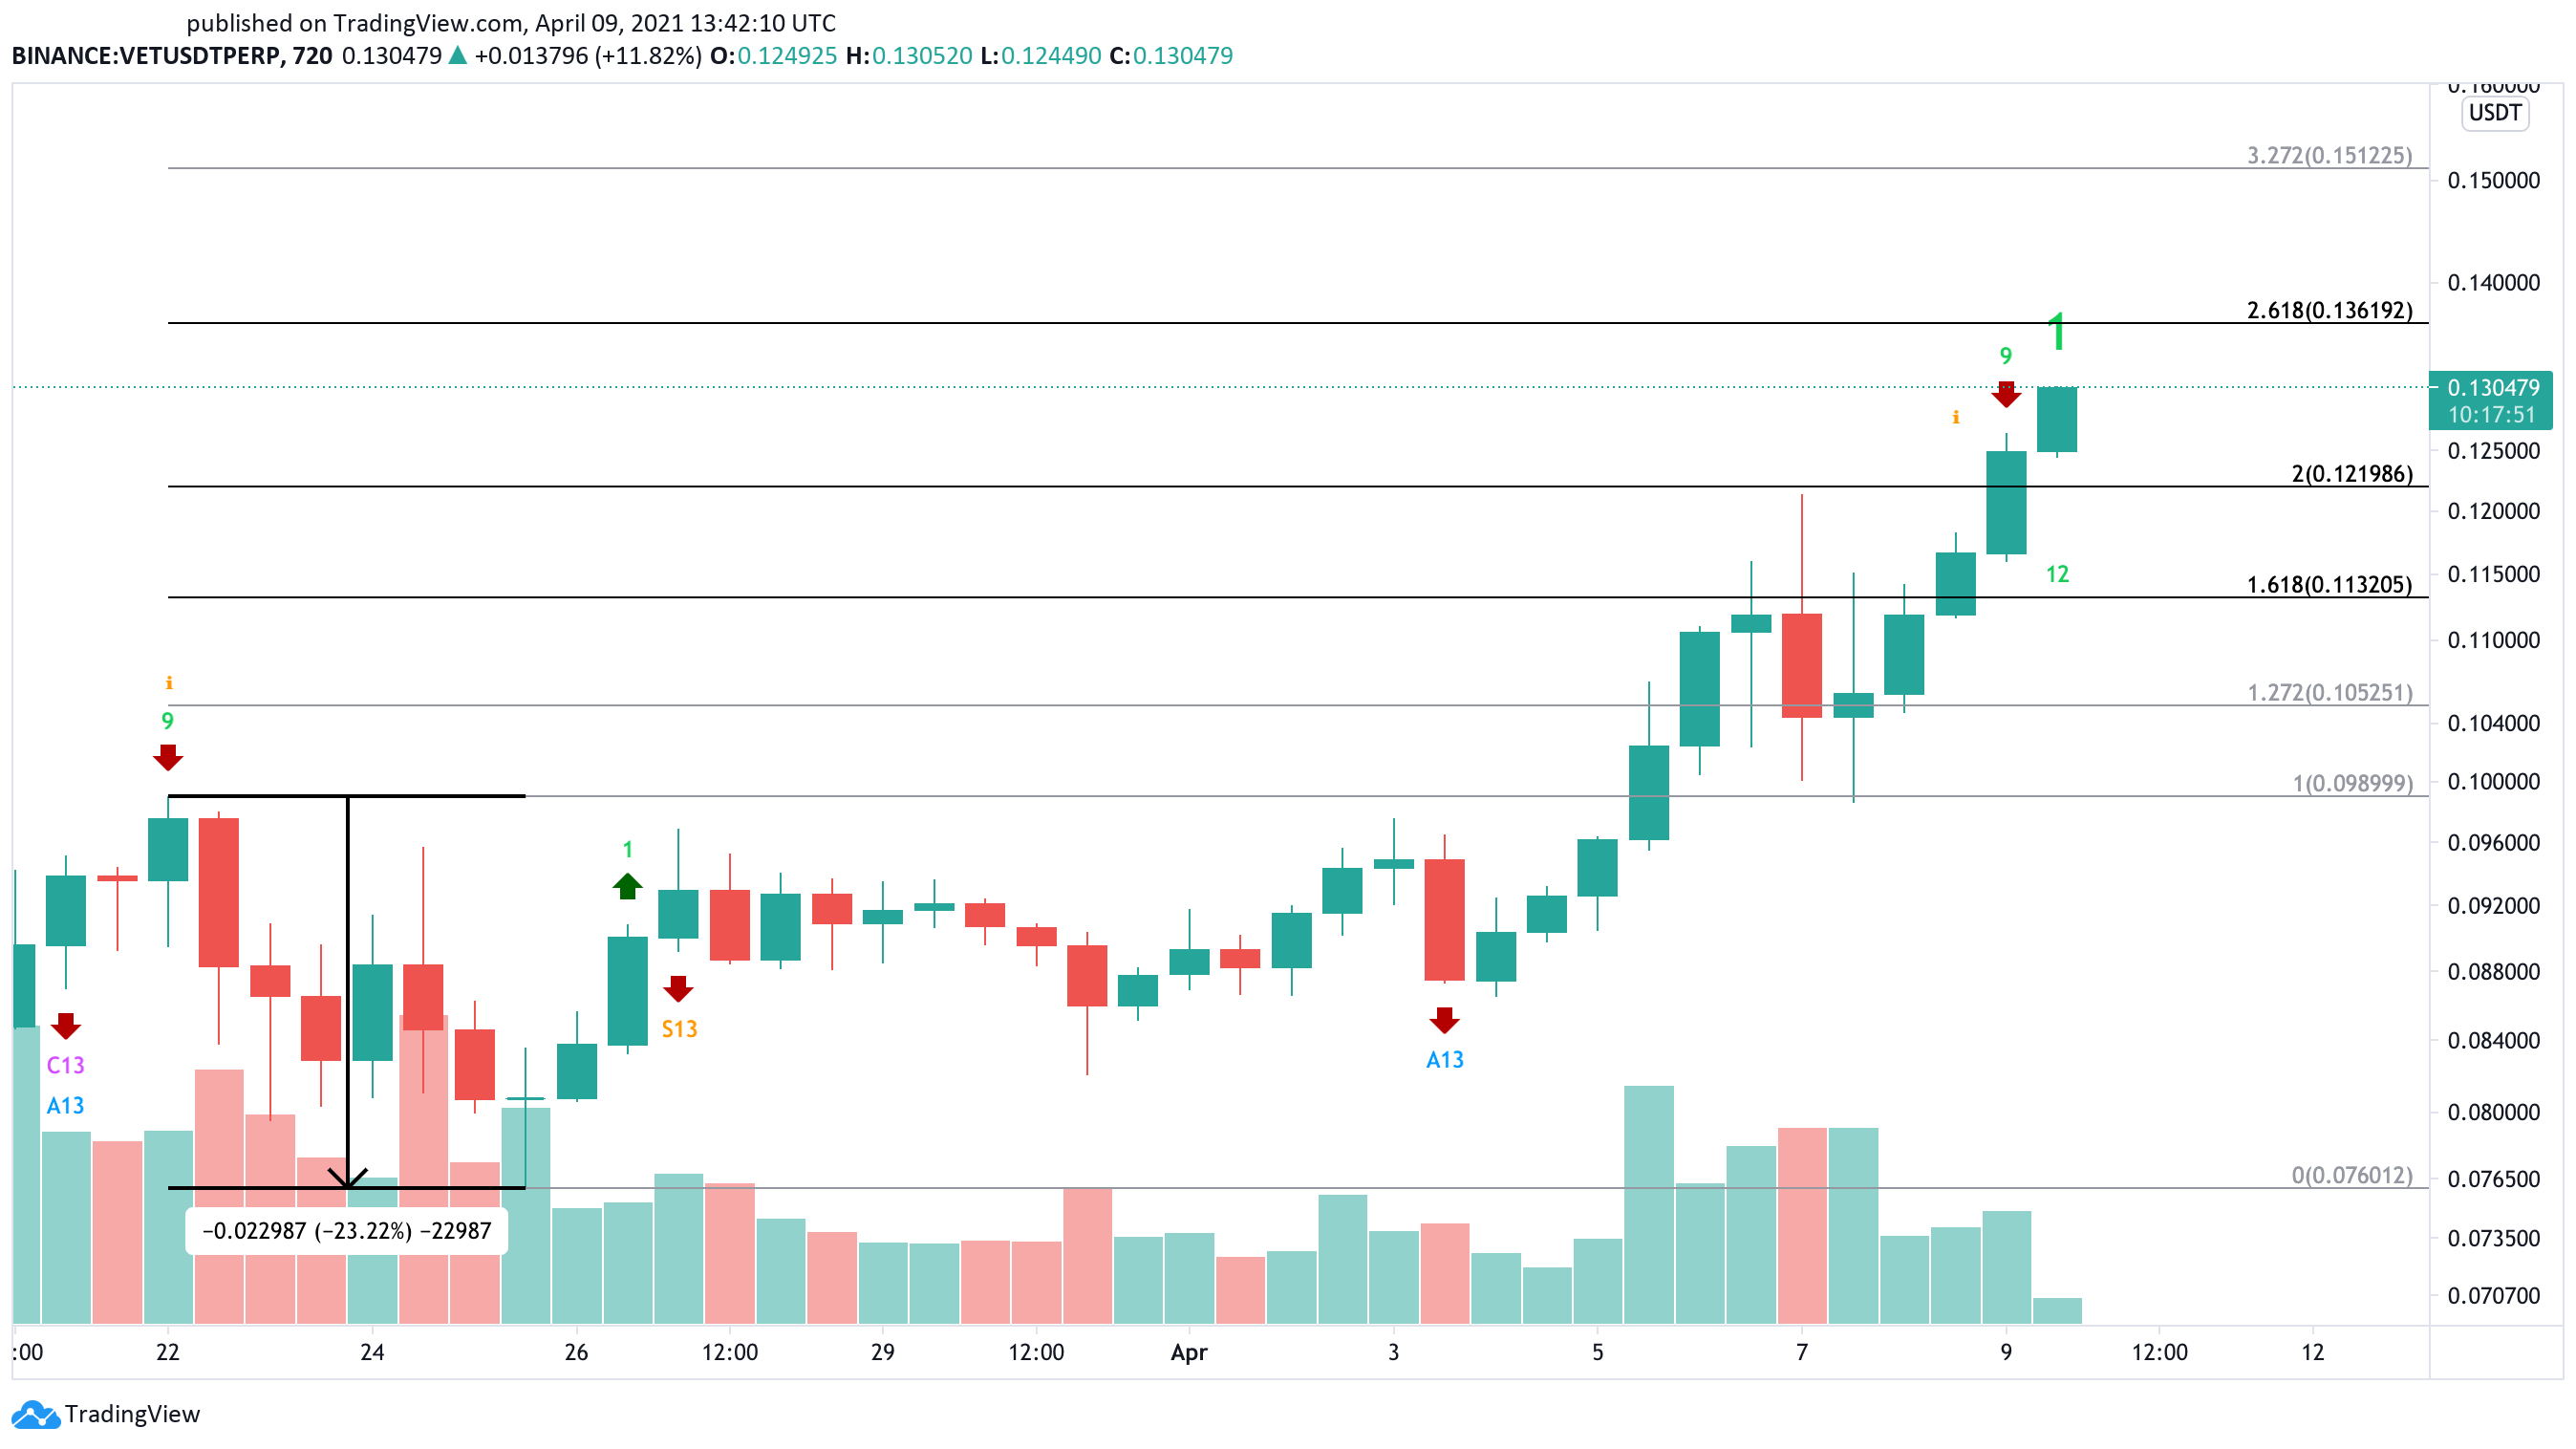 VeChain US dollar price chart